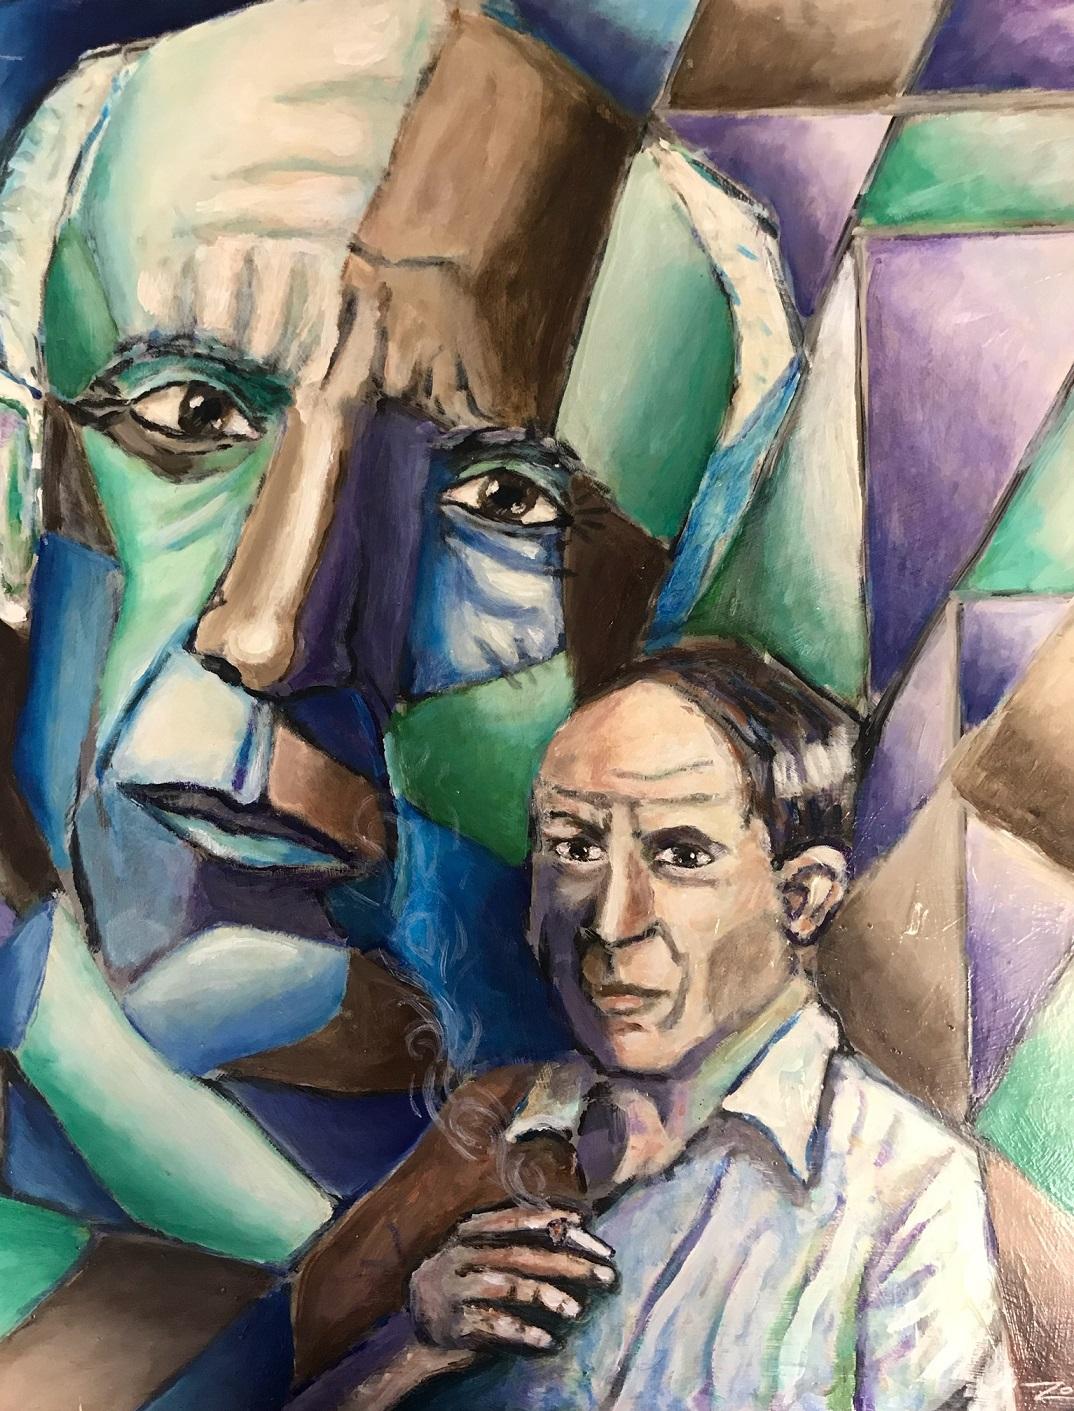 Artist Piece: Picasso Cubed